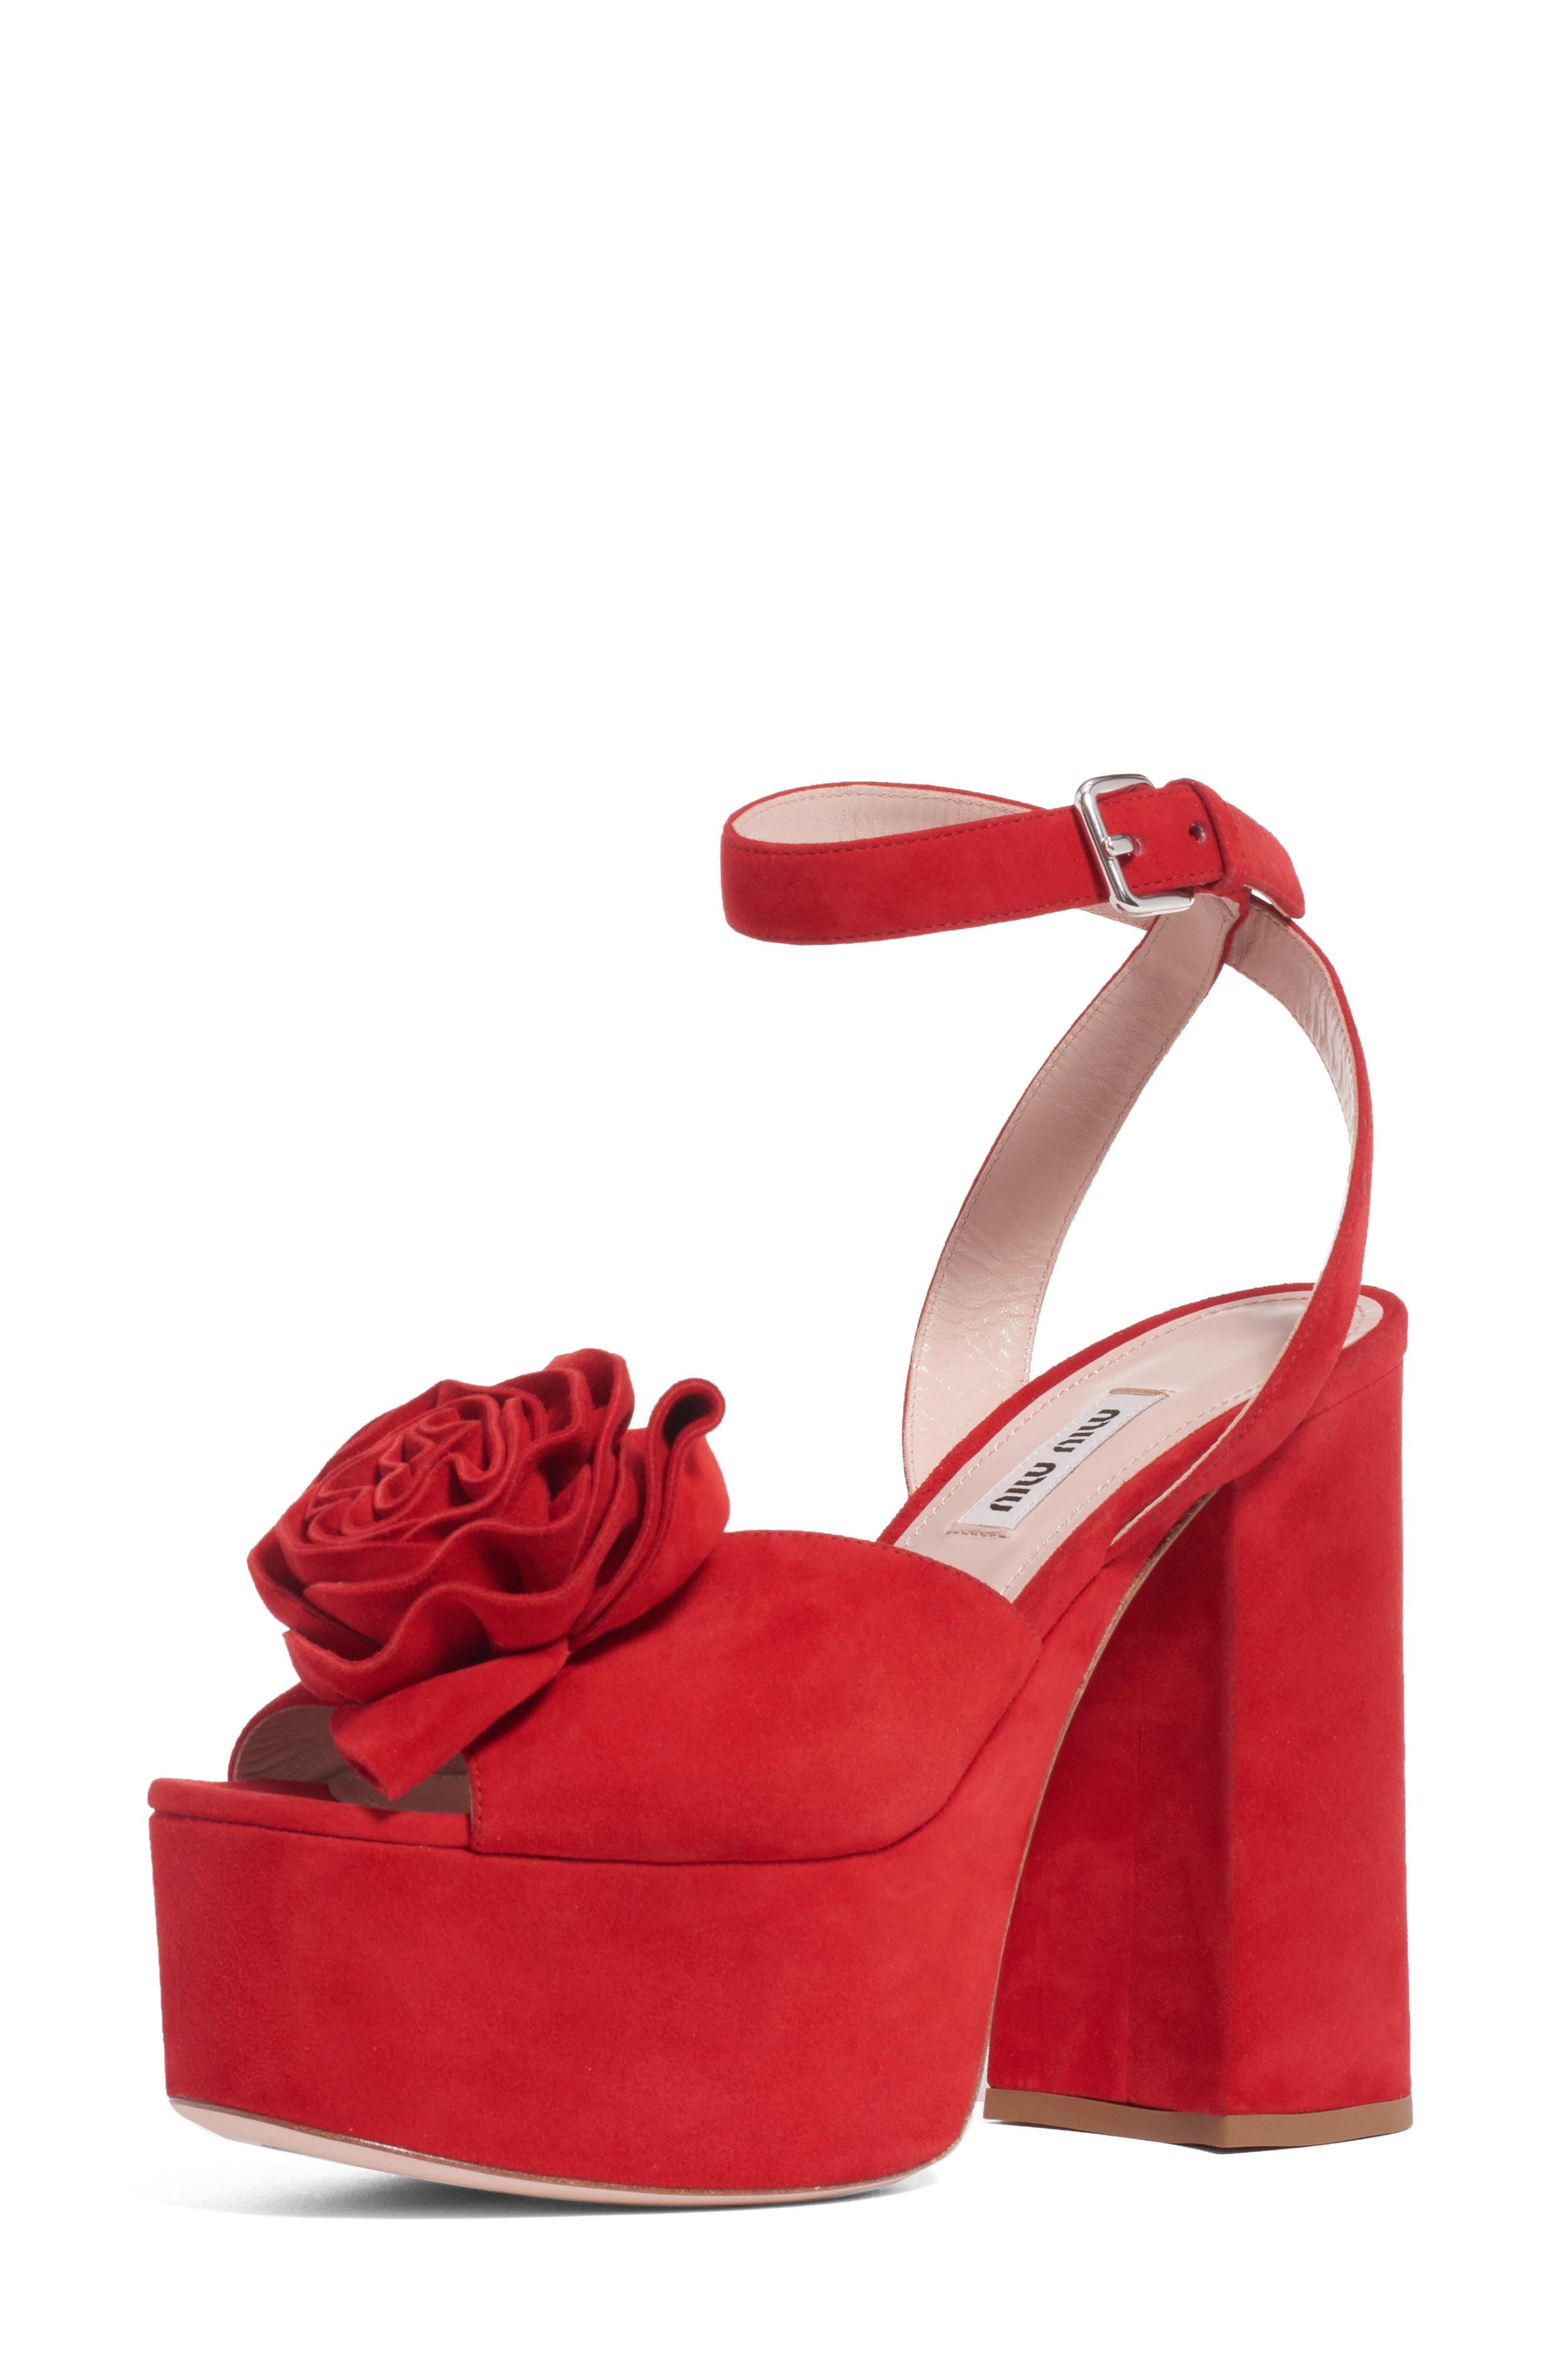 Miu Miu Slippers Flower Platform Sandal